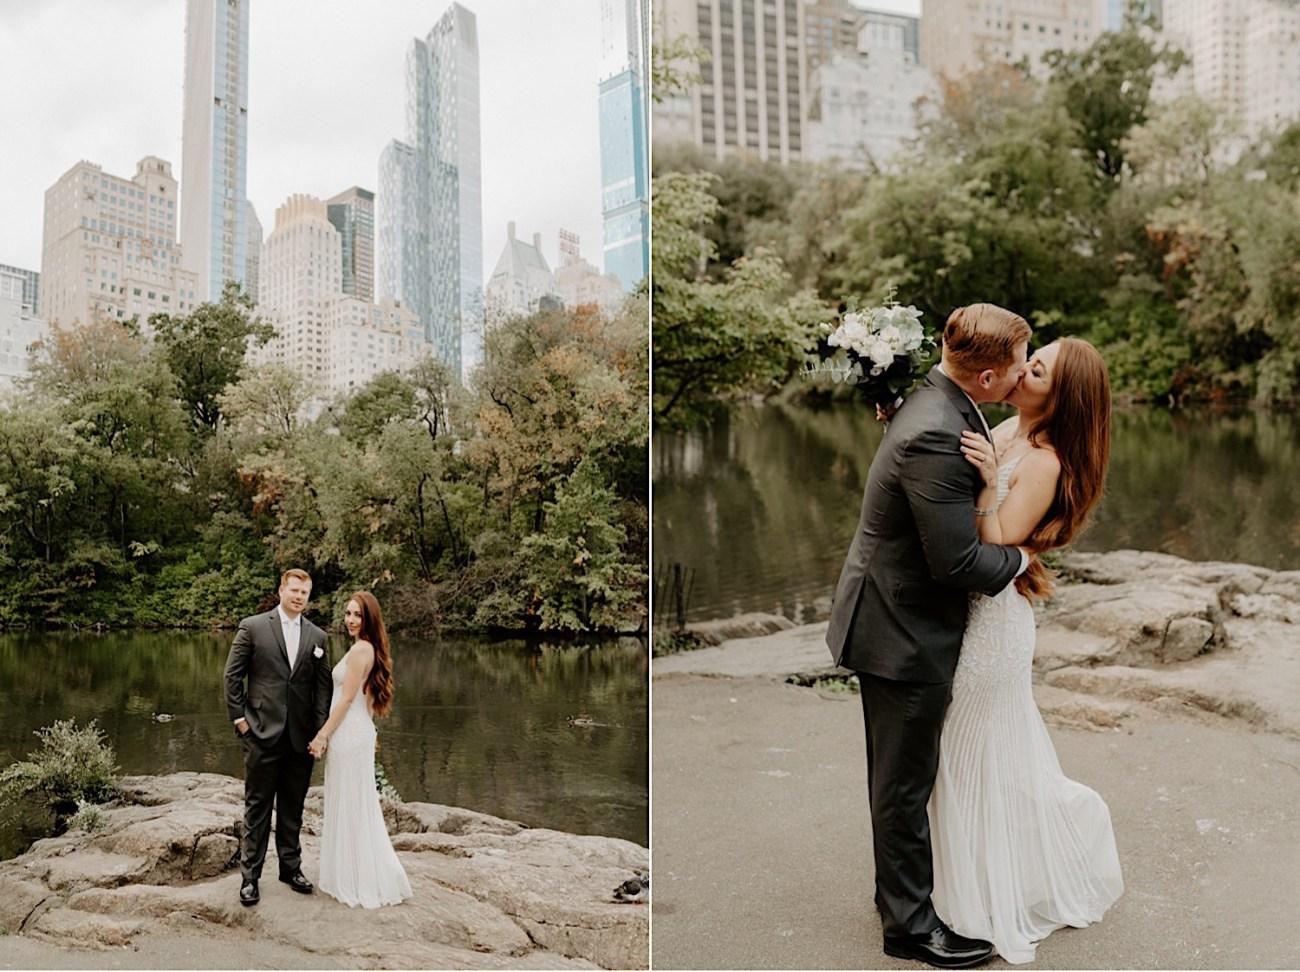 Central Park Wedding Photos Central Park Elopement NYC Wedding Photographer 09